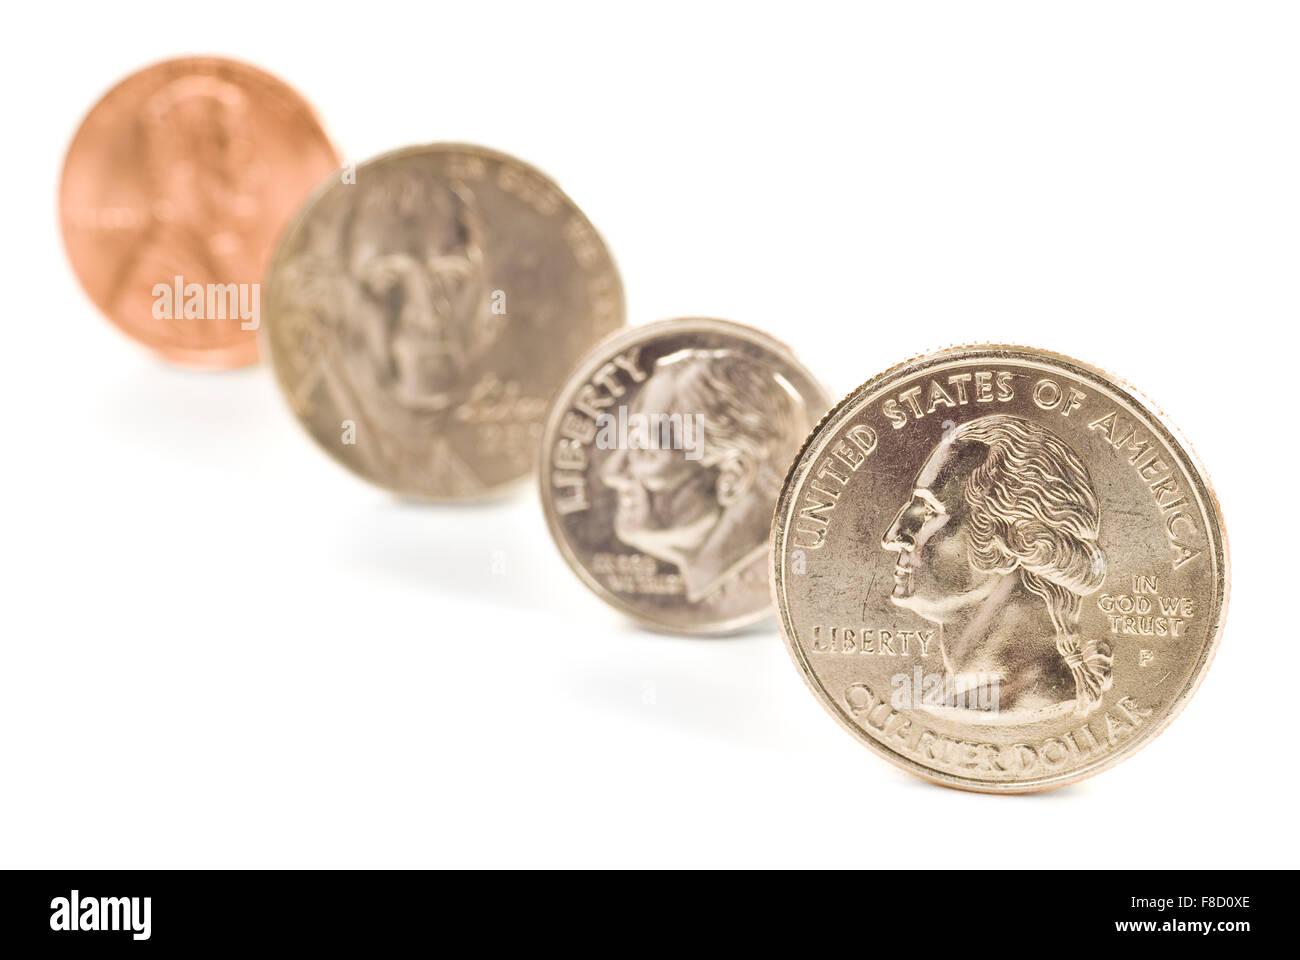 Dime Coin Stock Photos Amp Dime Coin Stock Images